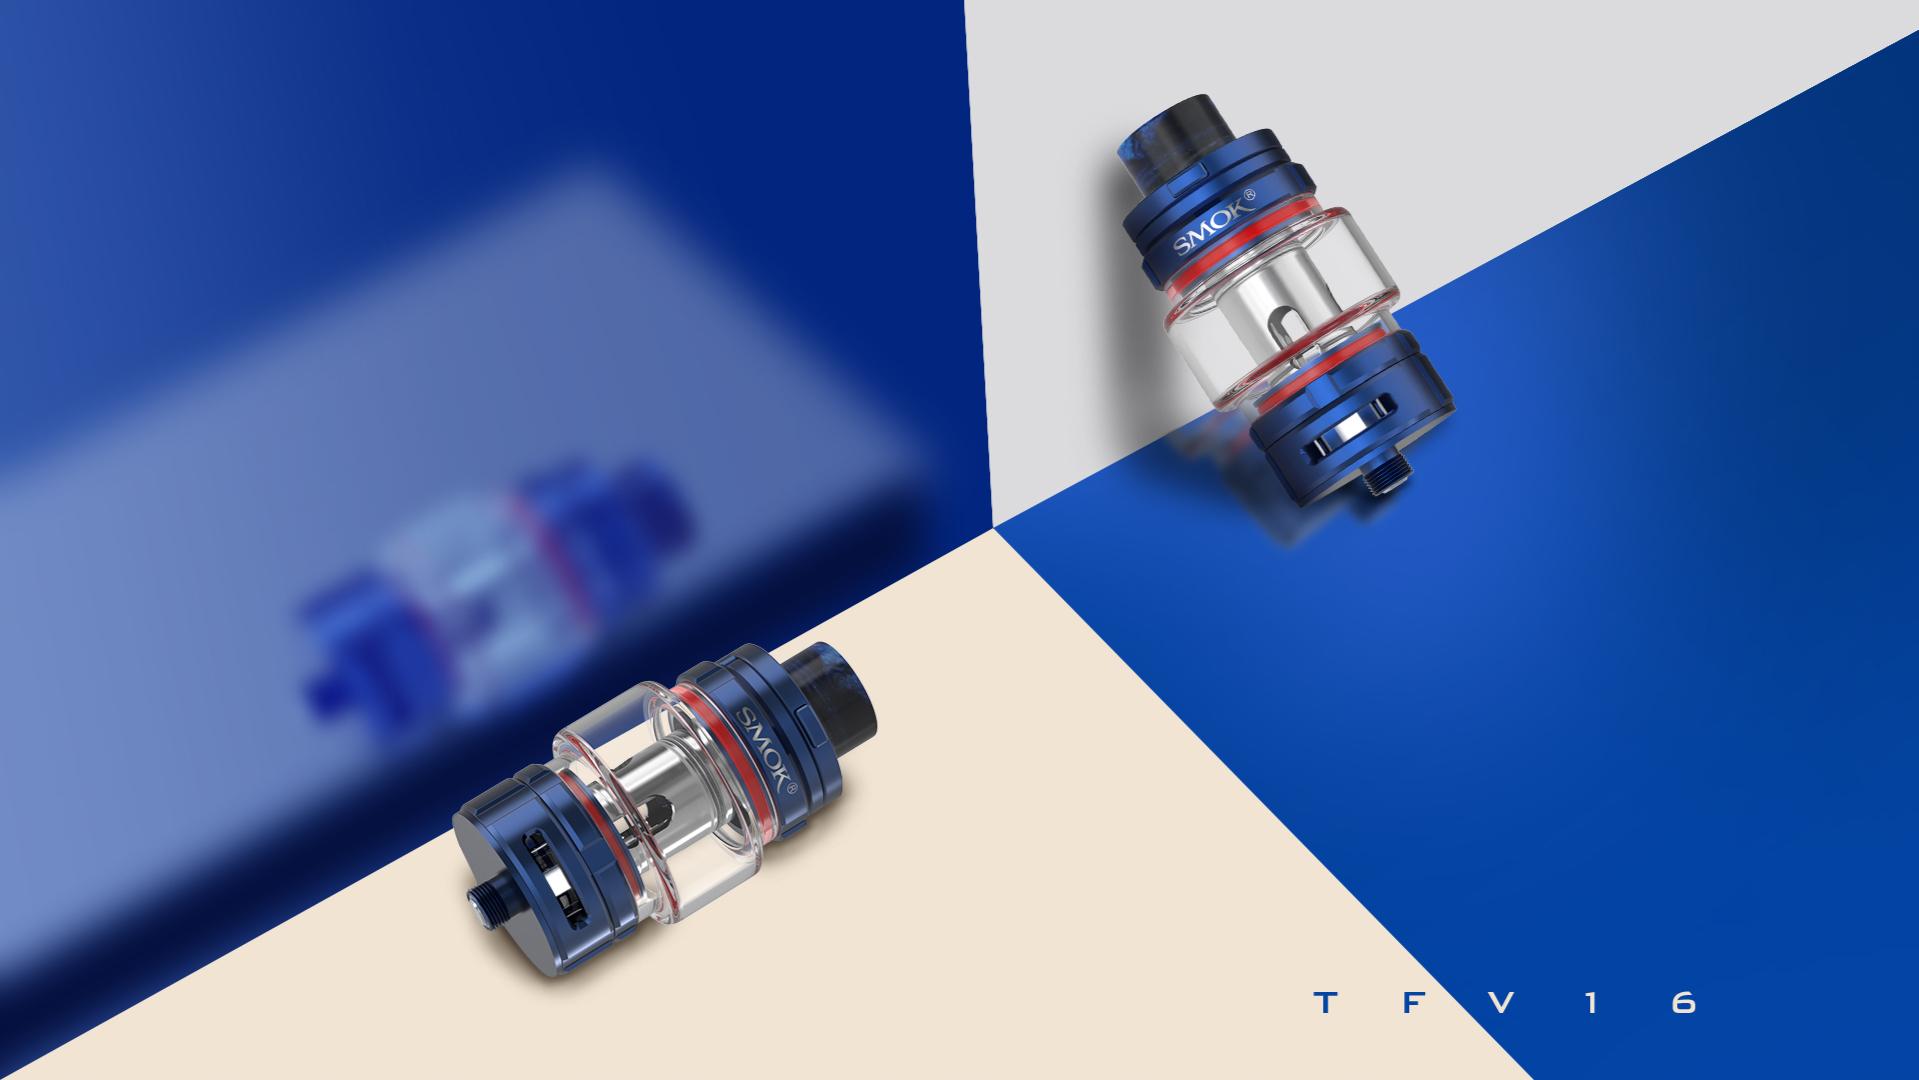 Noble Dark Blue Finish of SMOK TFV16 Tank